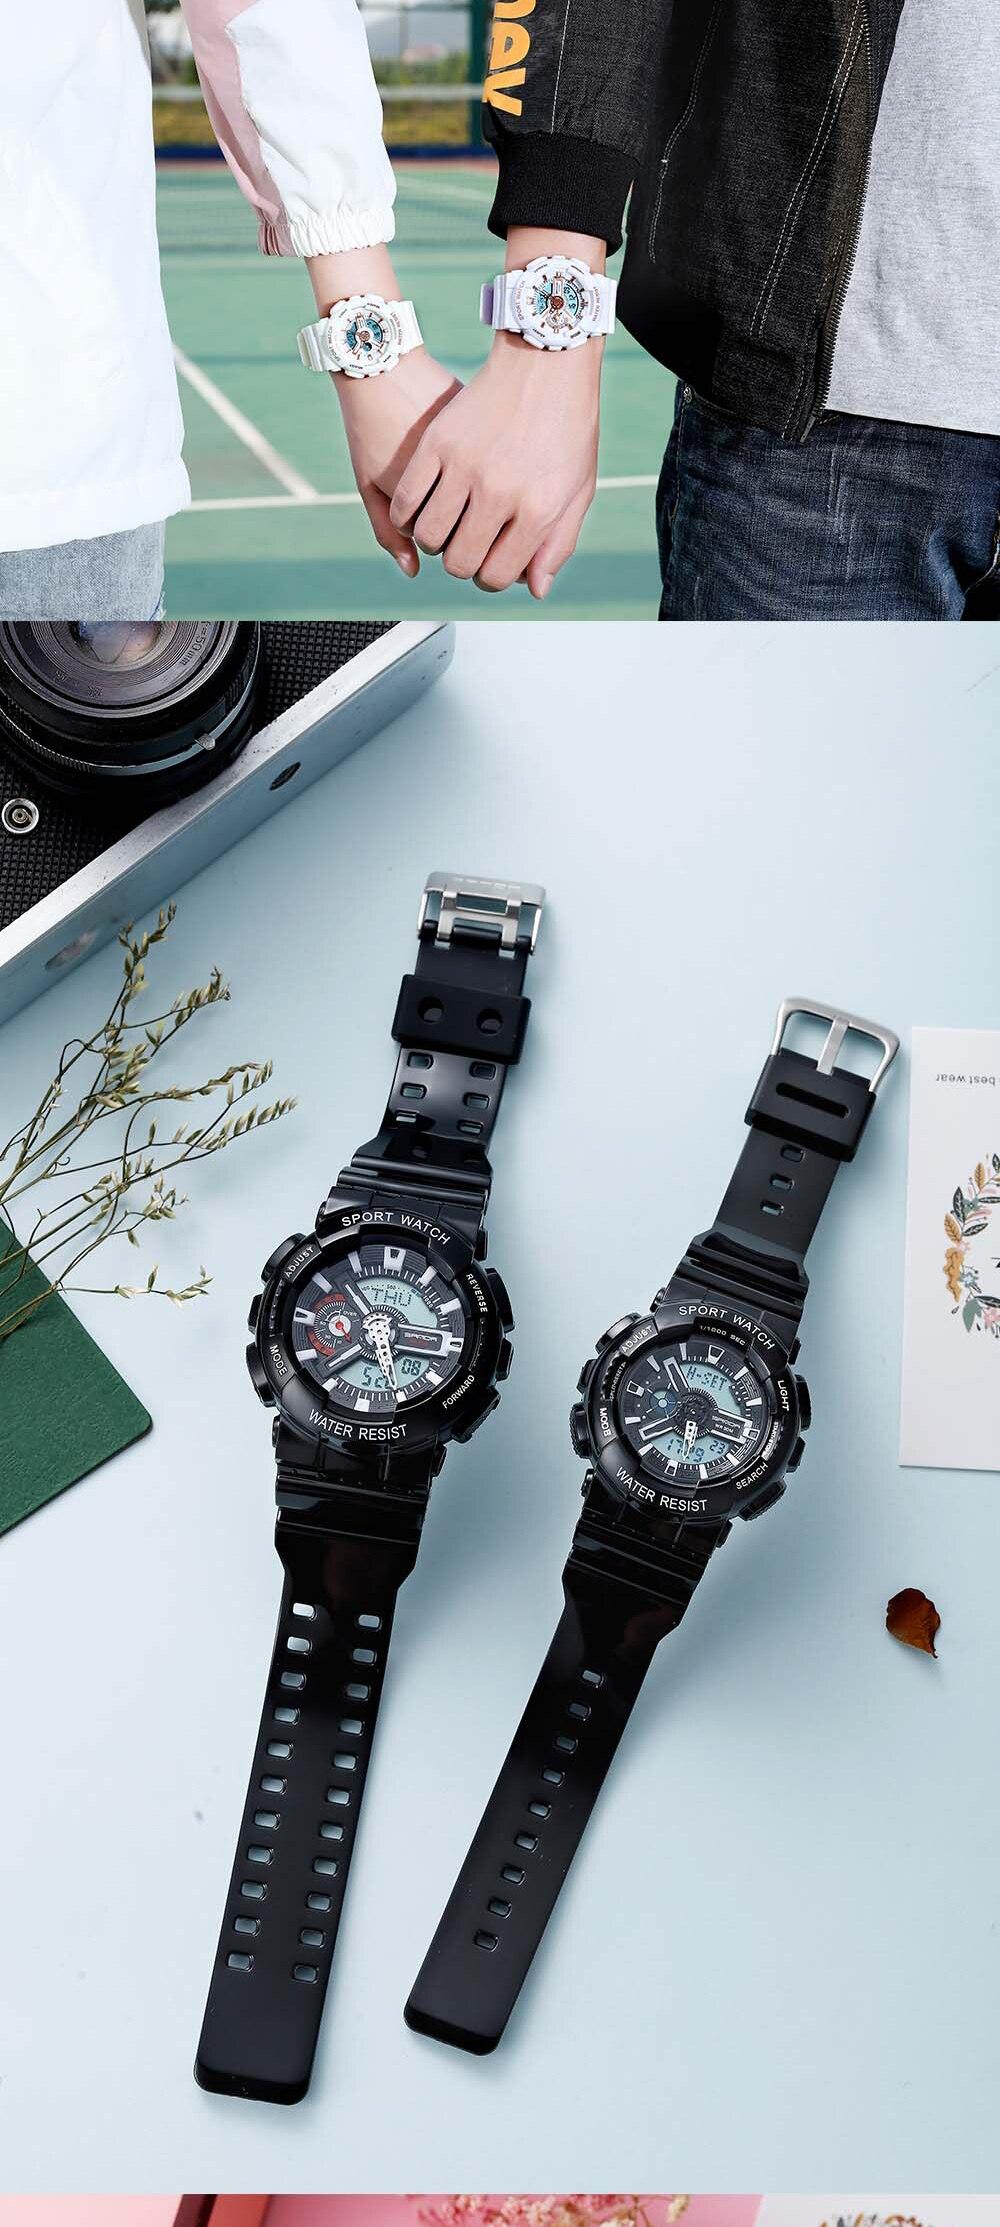 H367bba10482543b698e91319d0d70913b 2020 SANDA Military Men's Watch Brand Luxury Waterproof Sport Wristwatch Fashion Quartz Clock Couple Watch relogio masculino